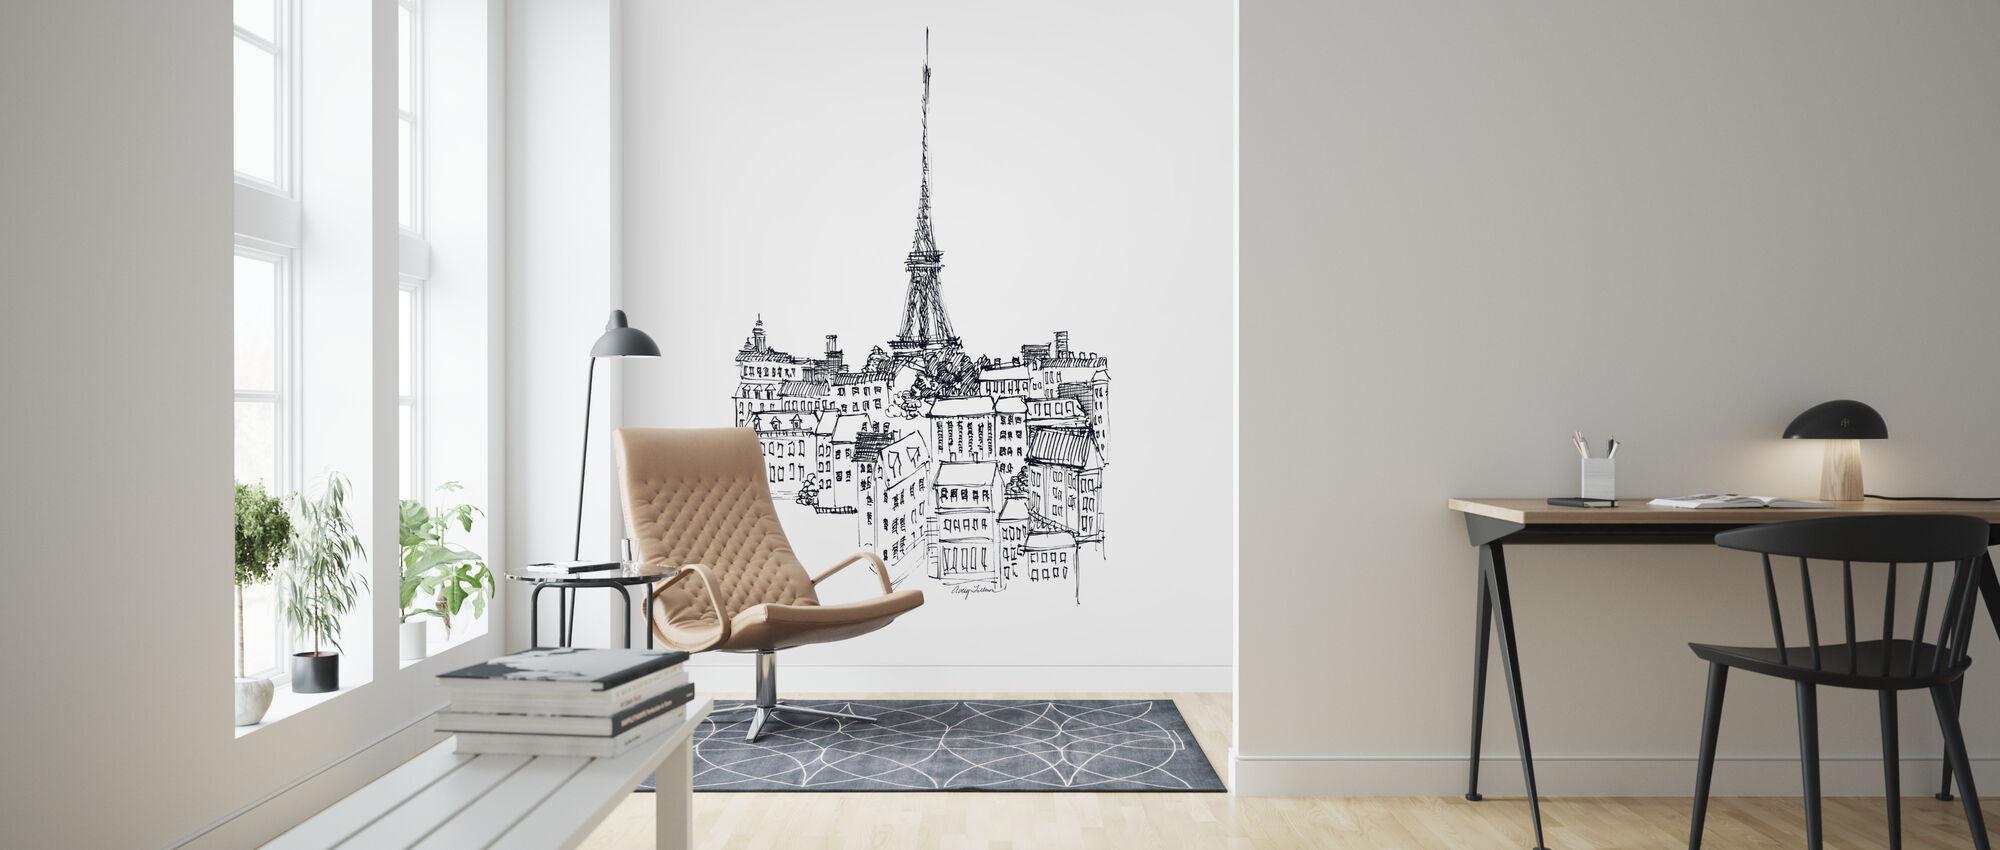 Avery Tillmon - Eiffeltoren - Behang - Woonkamer